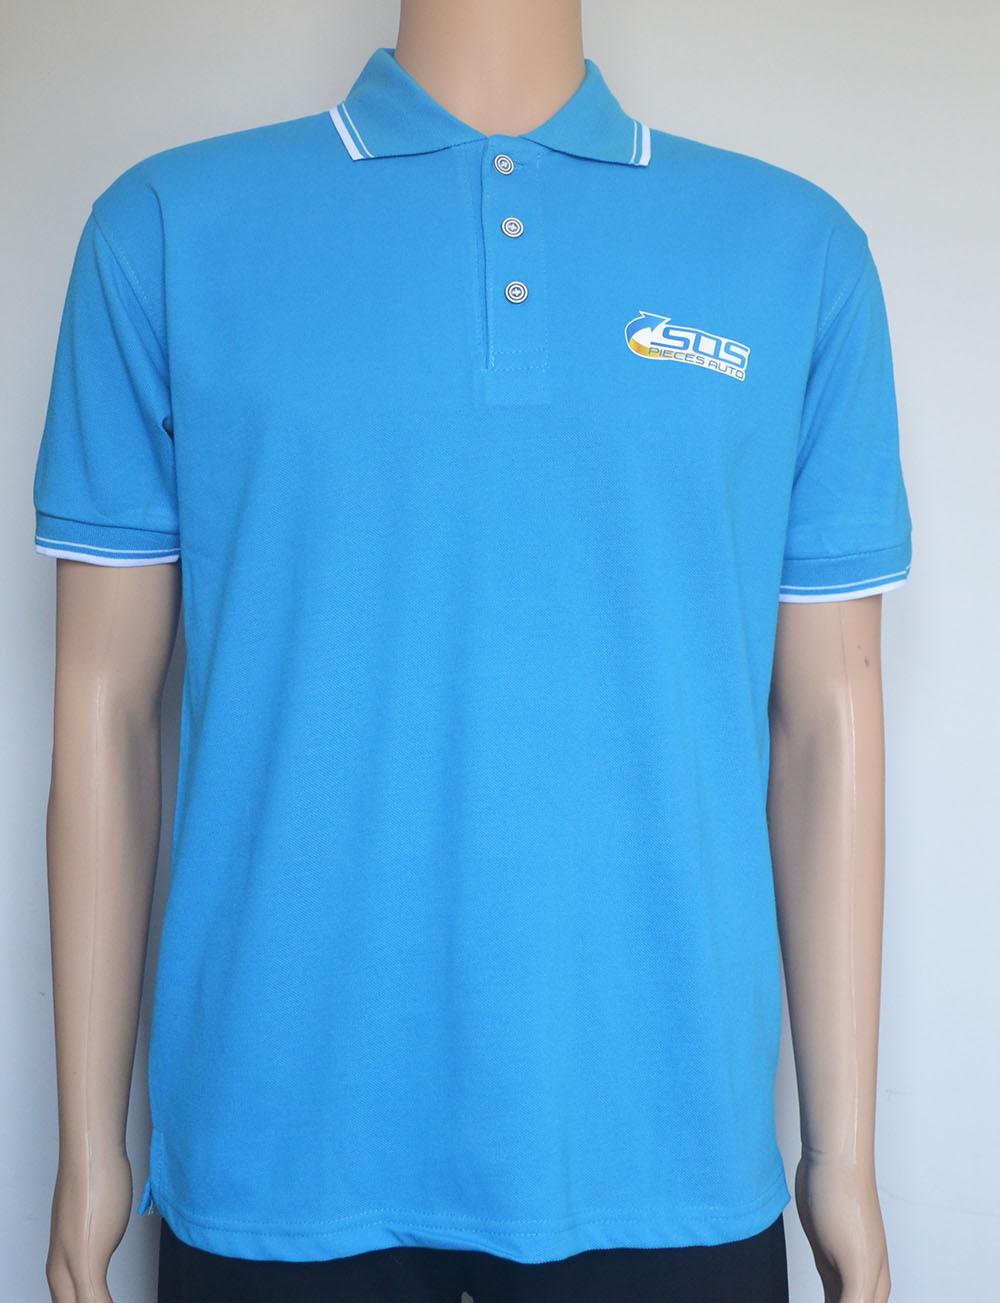 Custom Company Uniforms Polo Shirts In China Cheap Price Company